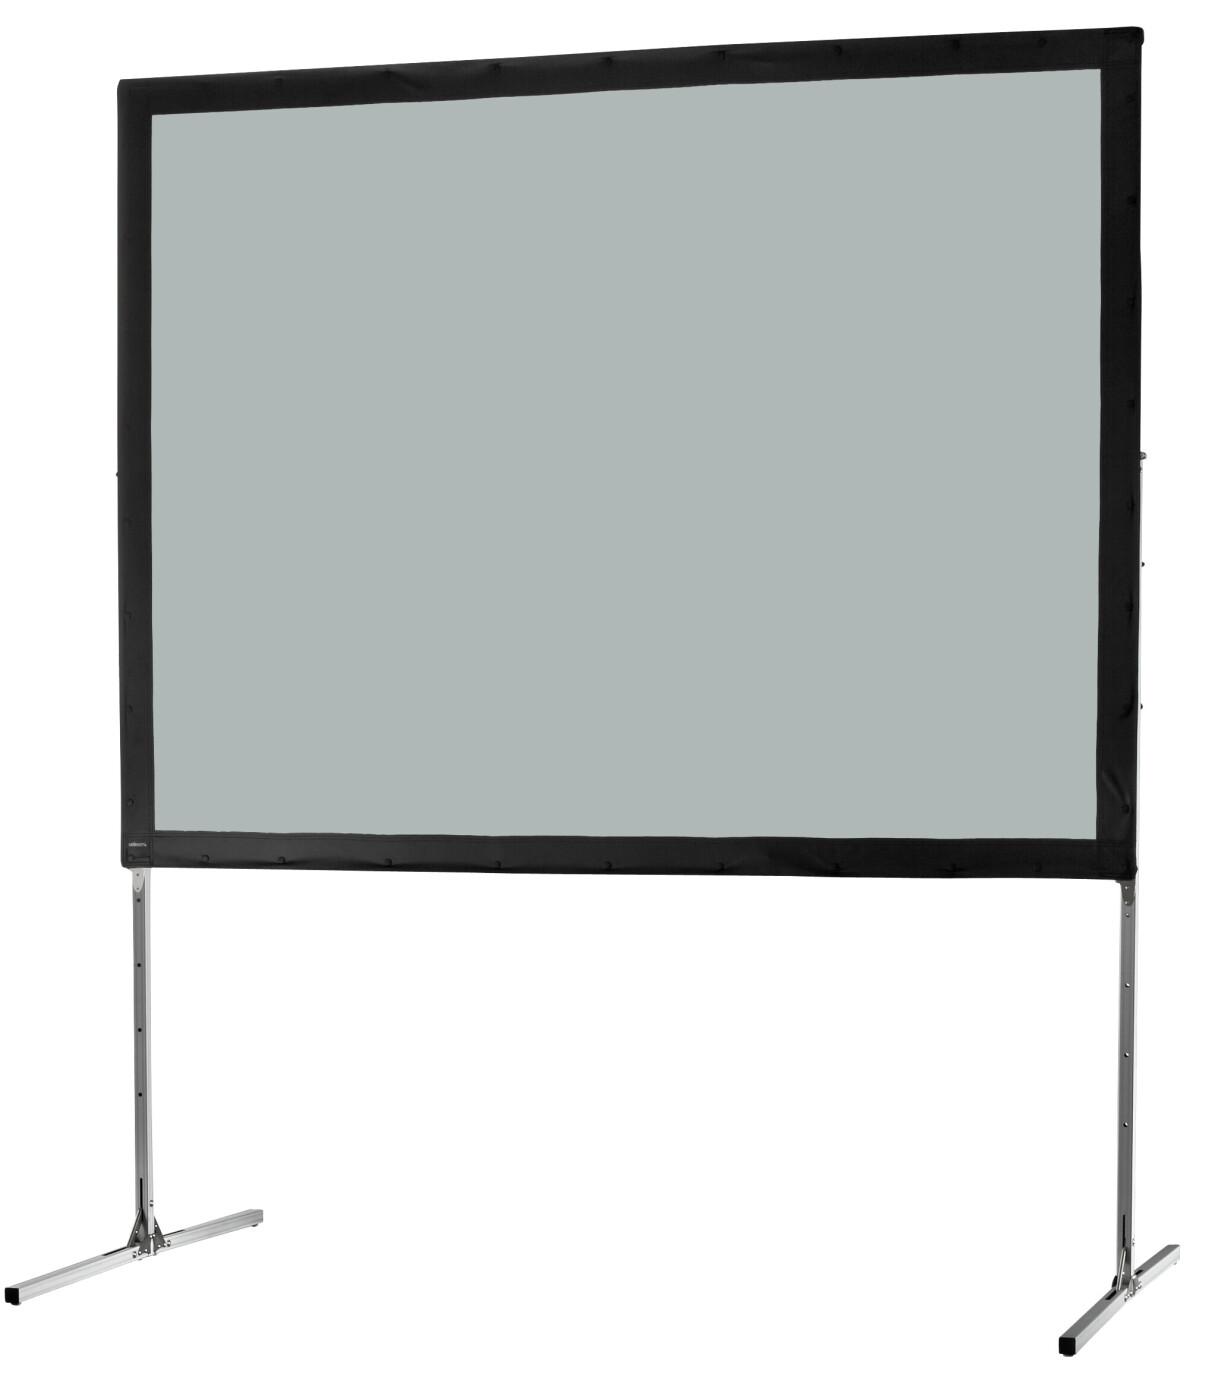 Celexon Mobile Expert - 203cm x 152cm - Rear Projection - 4:3 - Fast Fold Projector Screen - Rear Complete